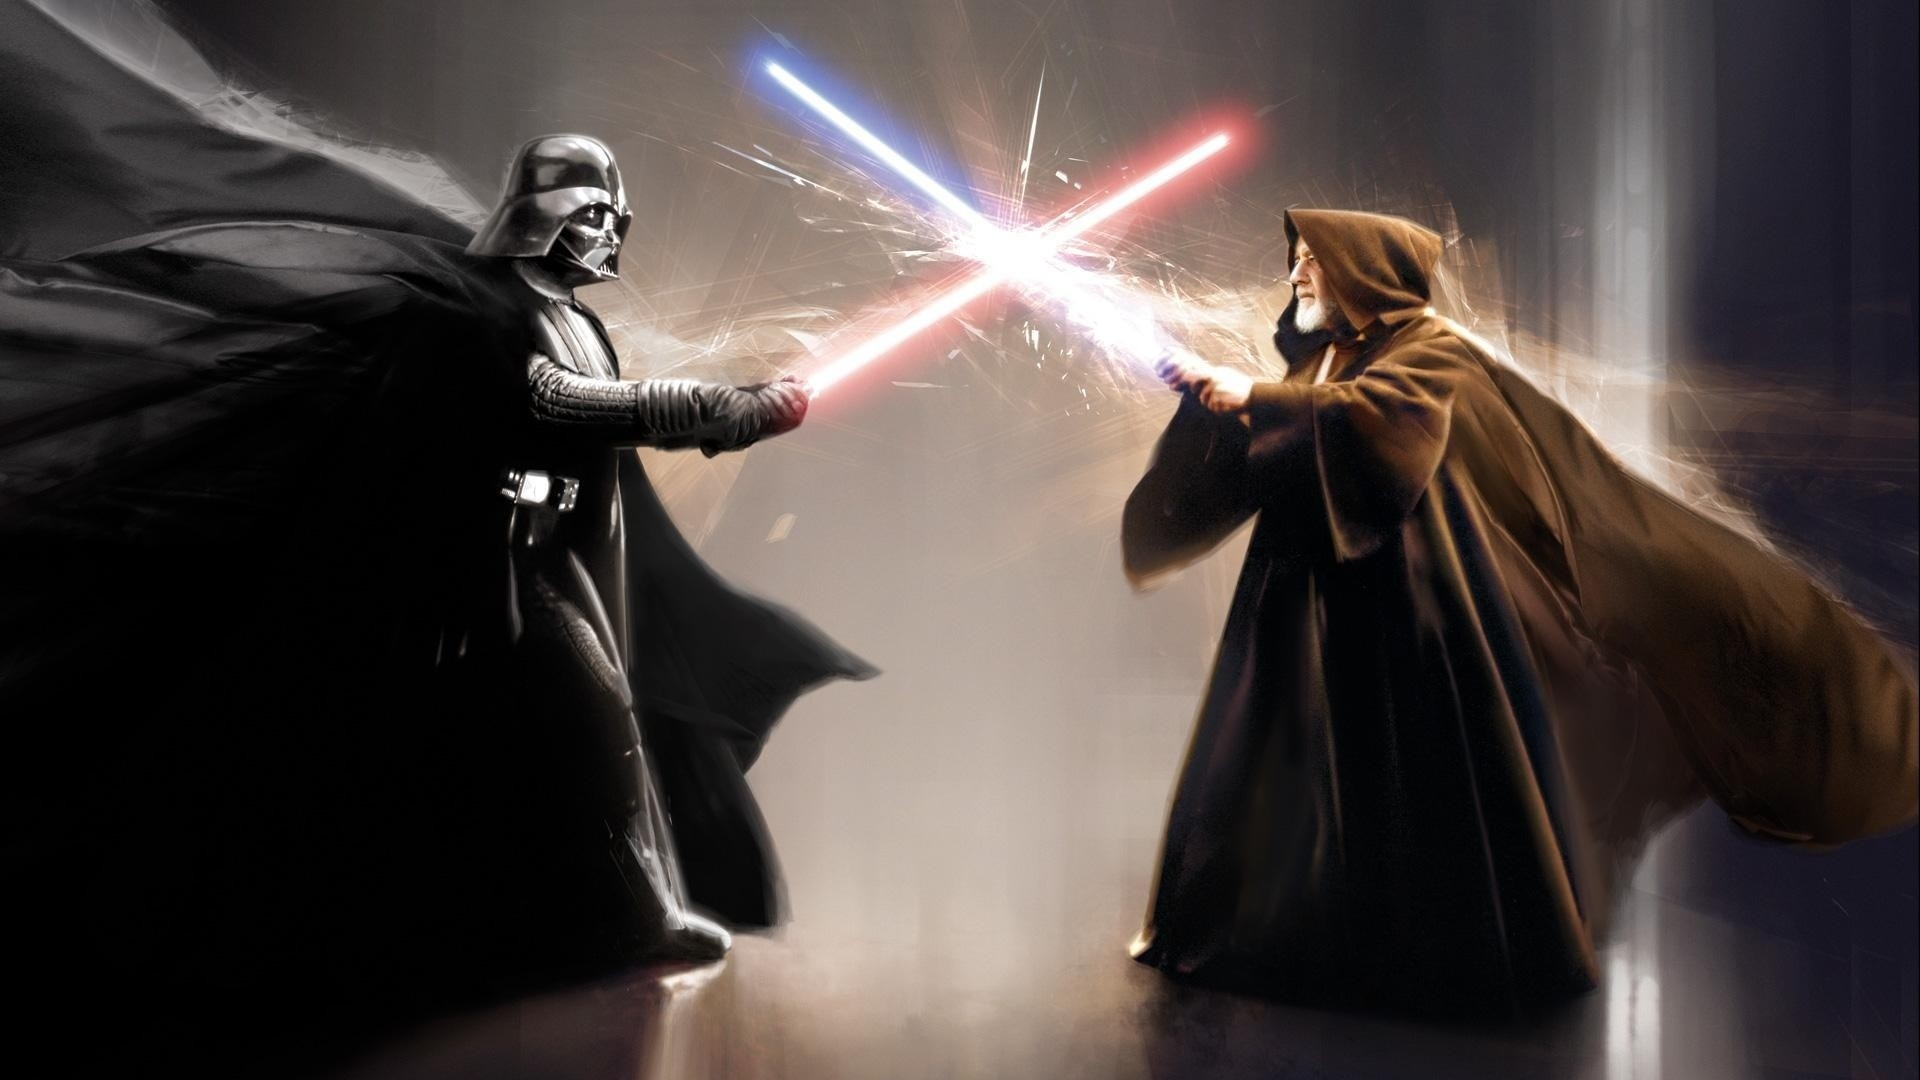 Darth Vader Obi Wan Kenobi movies star wars sci-fi weapons lightsaber  battle video games